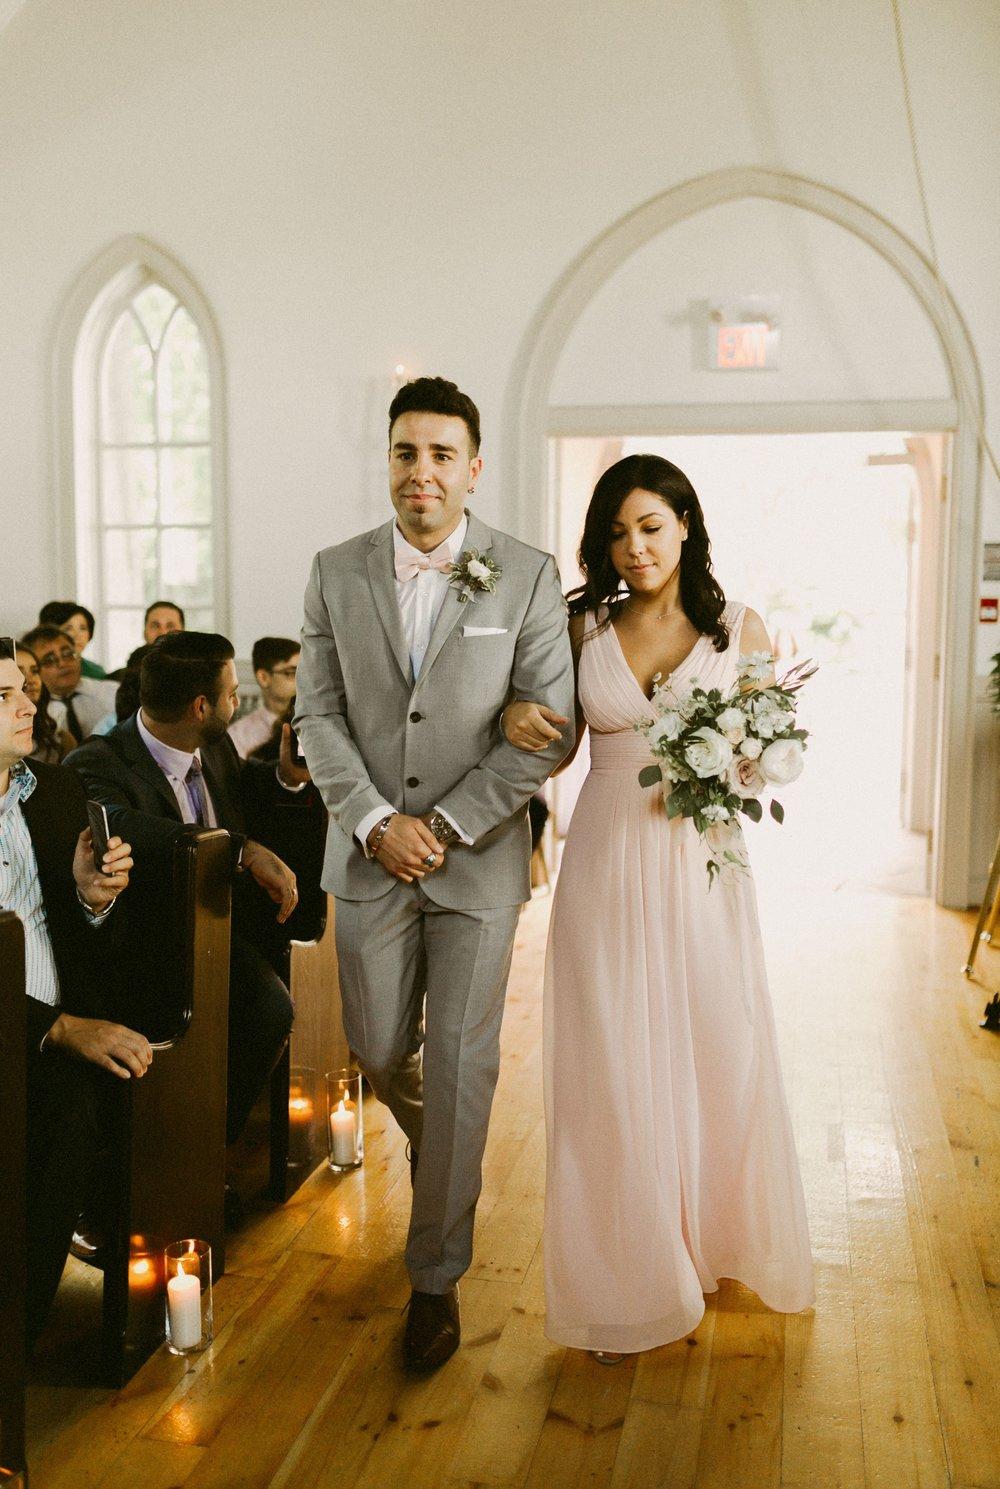 DanielaKamal_WEDDING_DOCTORSHOUSE_bisouseventsYAS-206ASE.jpg